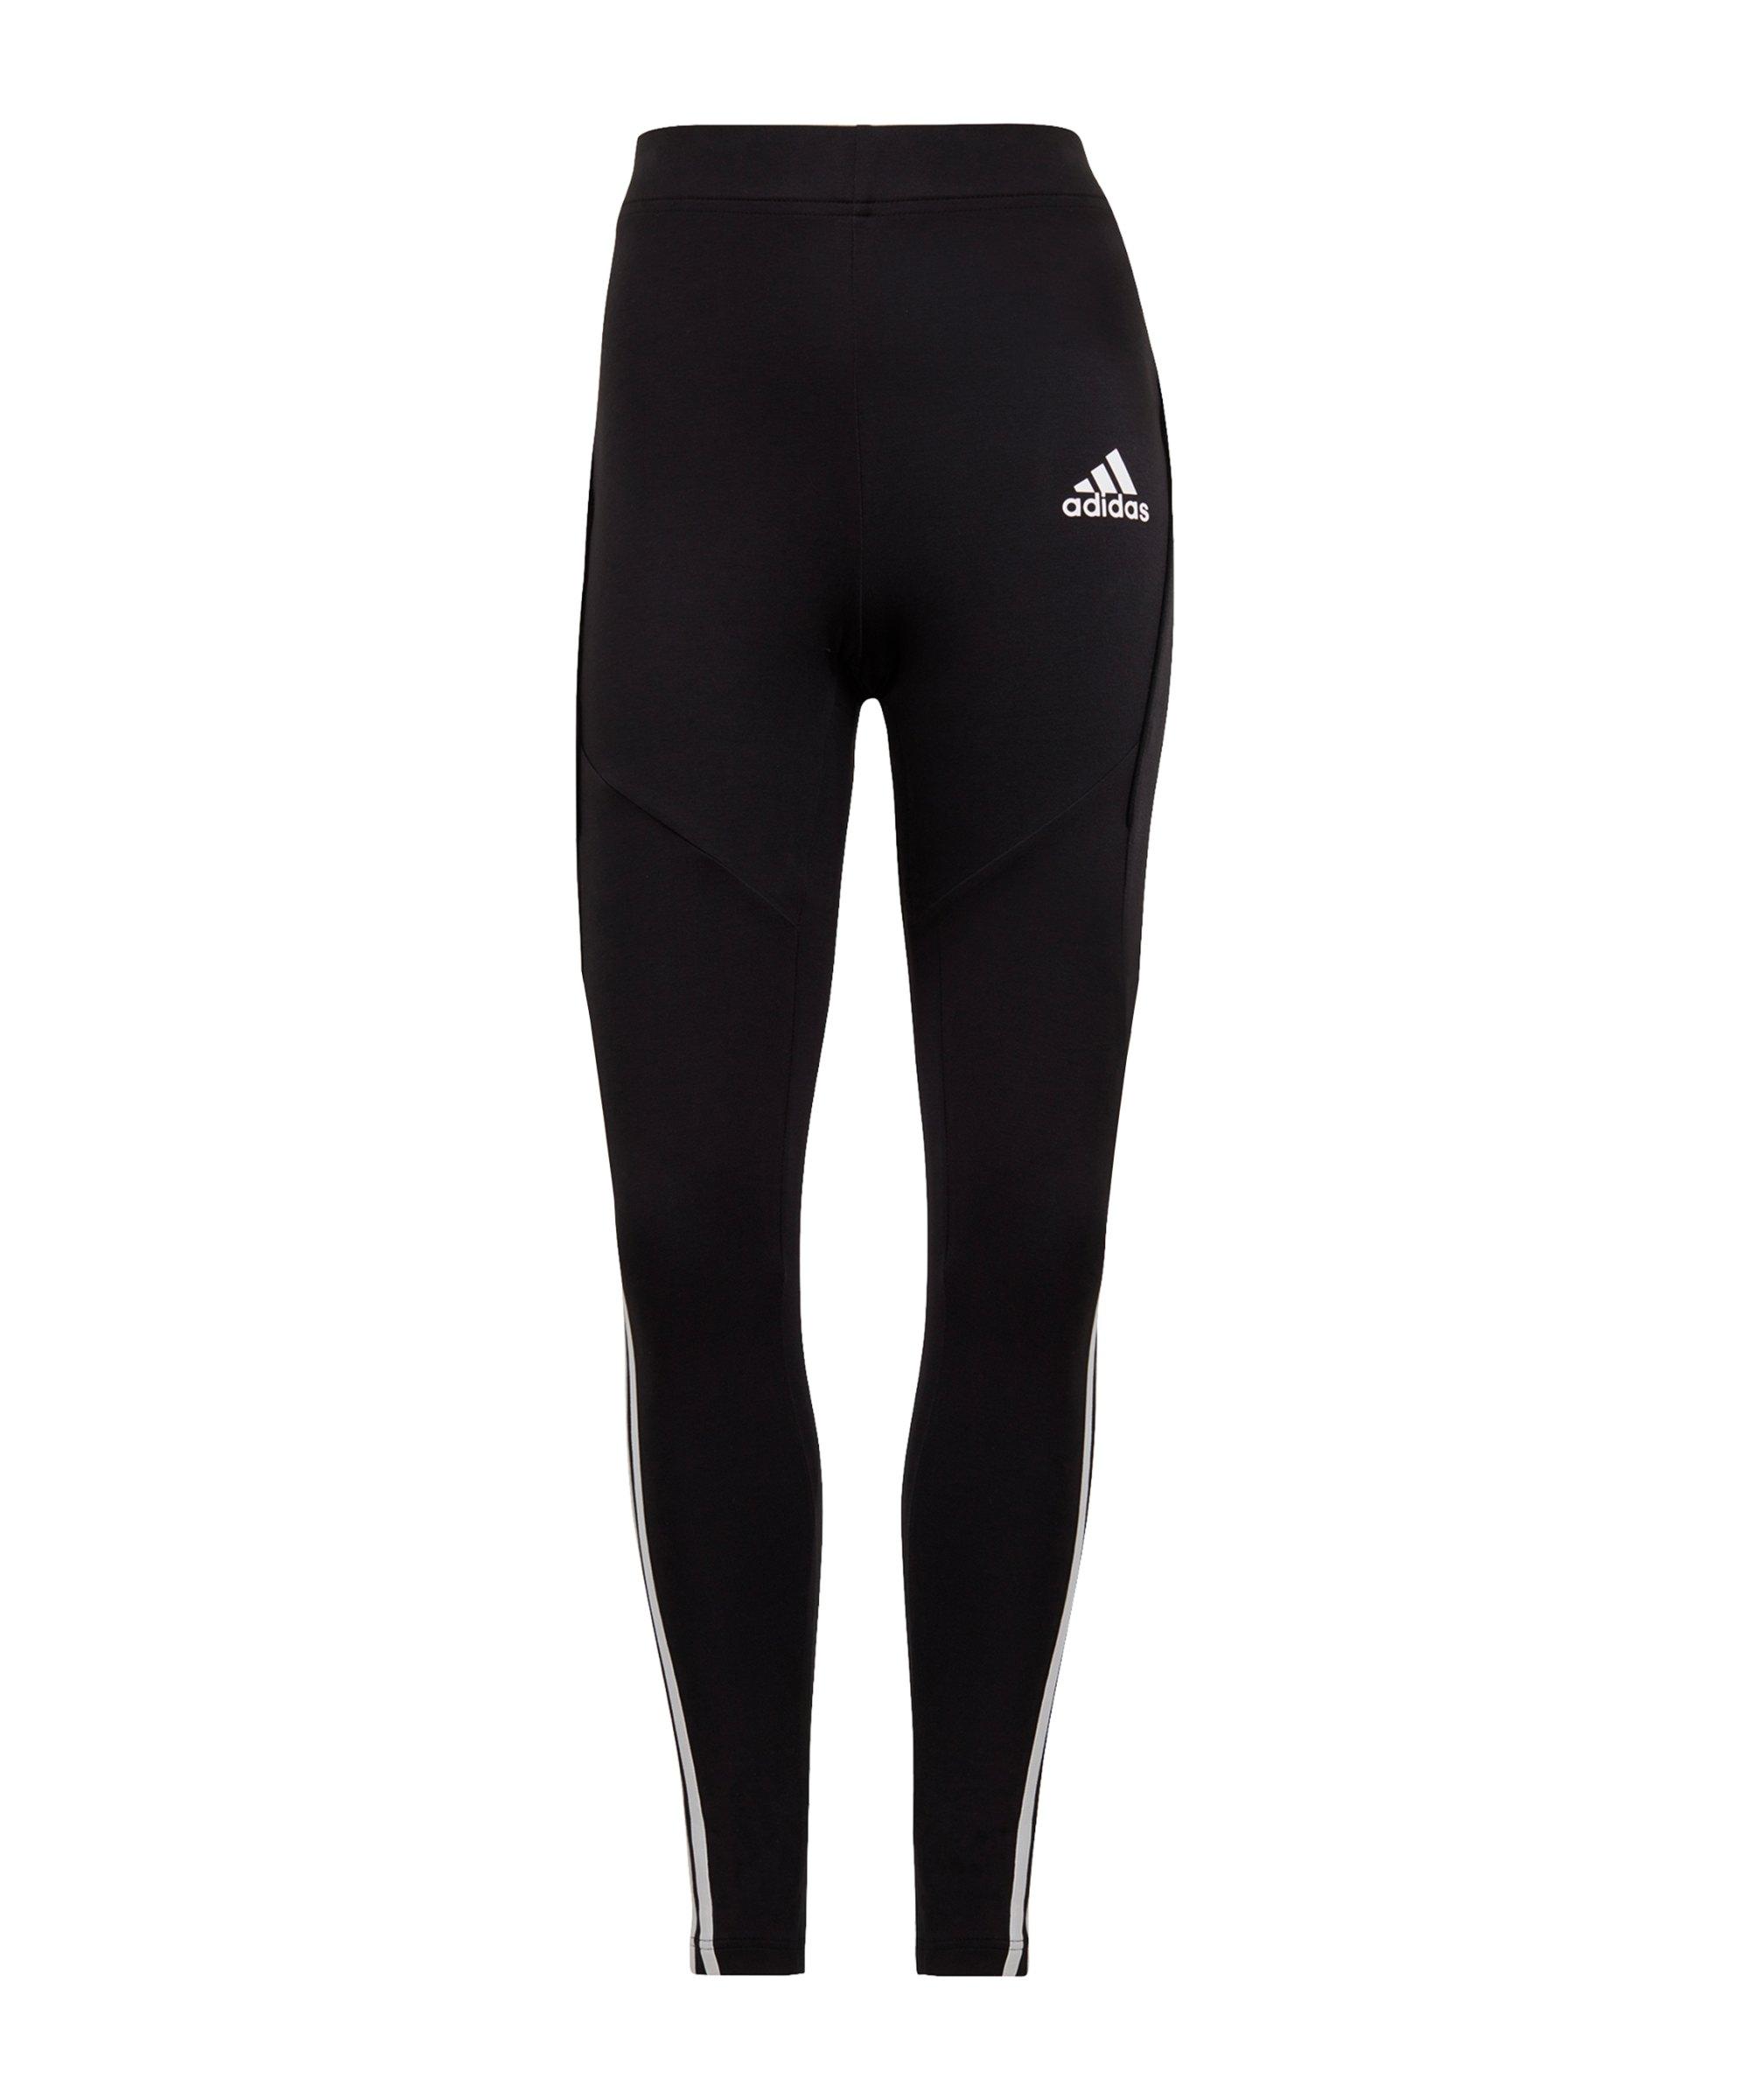 adidas Colorbloked Leggings Damen Schwarz - schwarz